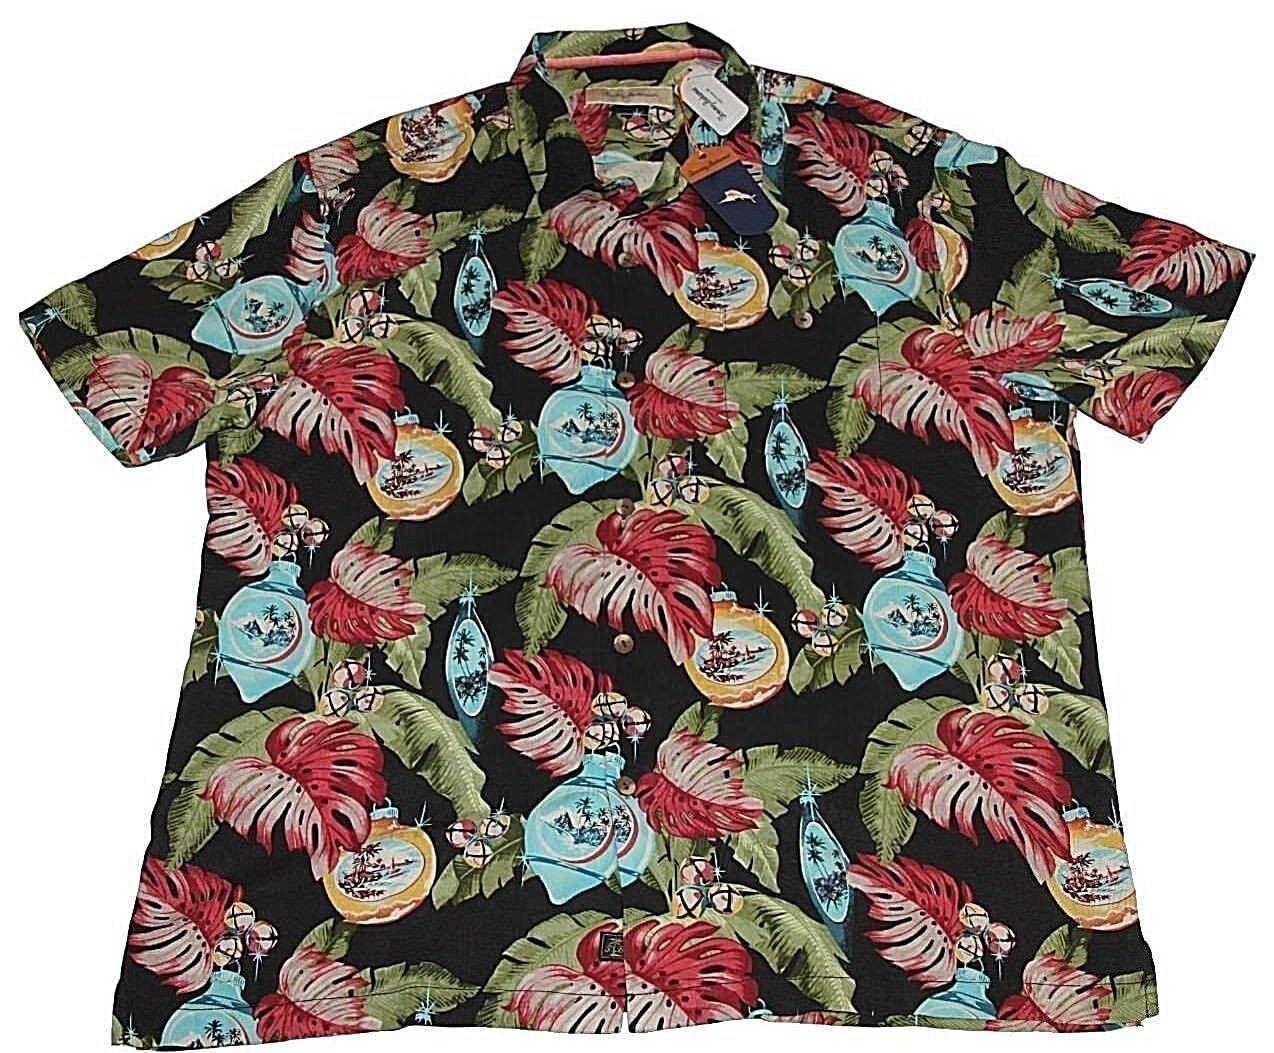 Tommy Bahama Shirt Camp Shirt Bahama With Bells On Onyx BT317742 Nuovo 100% Silk  Sz XLT NWT 8fceca